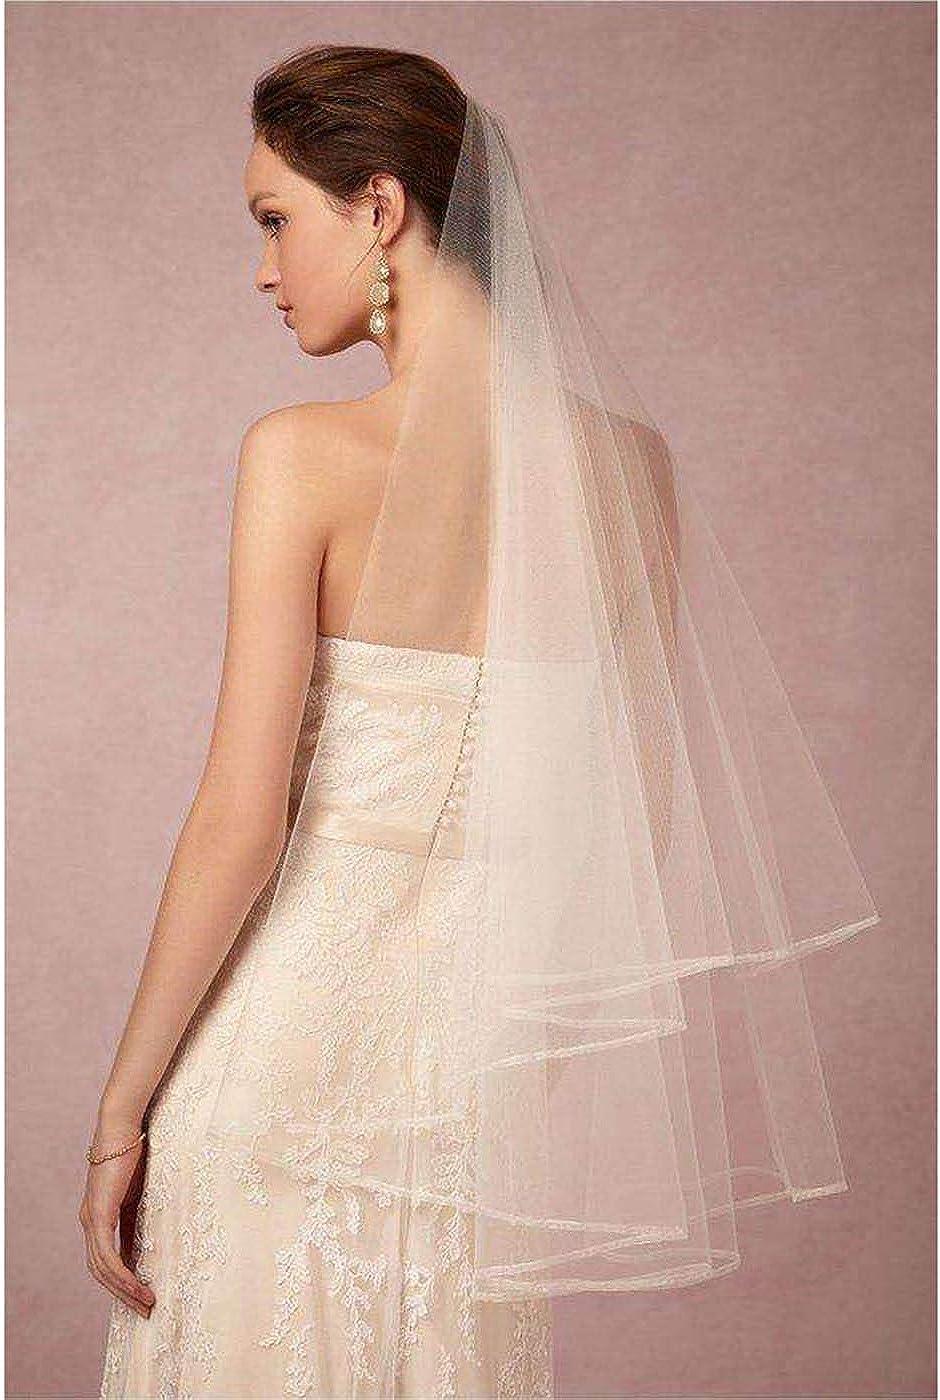 Edary Wedding Bridal Veil with Comb White Pencil Edge Drop Veil 2 Tier Brides Hair Accessories for Women Elbow Length